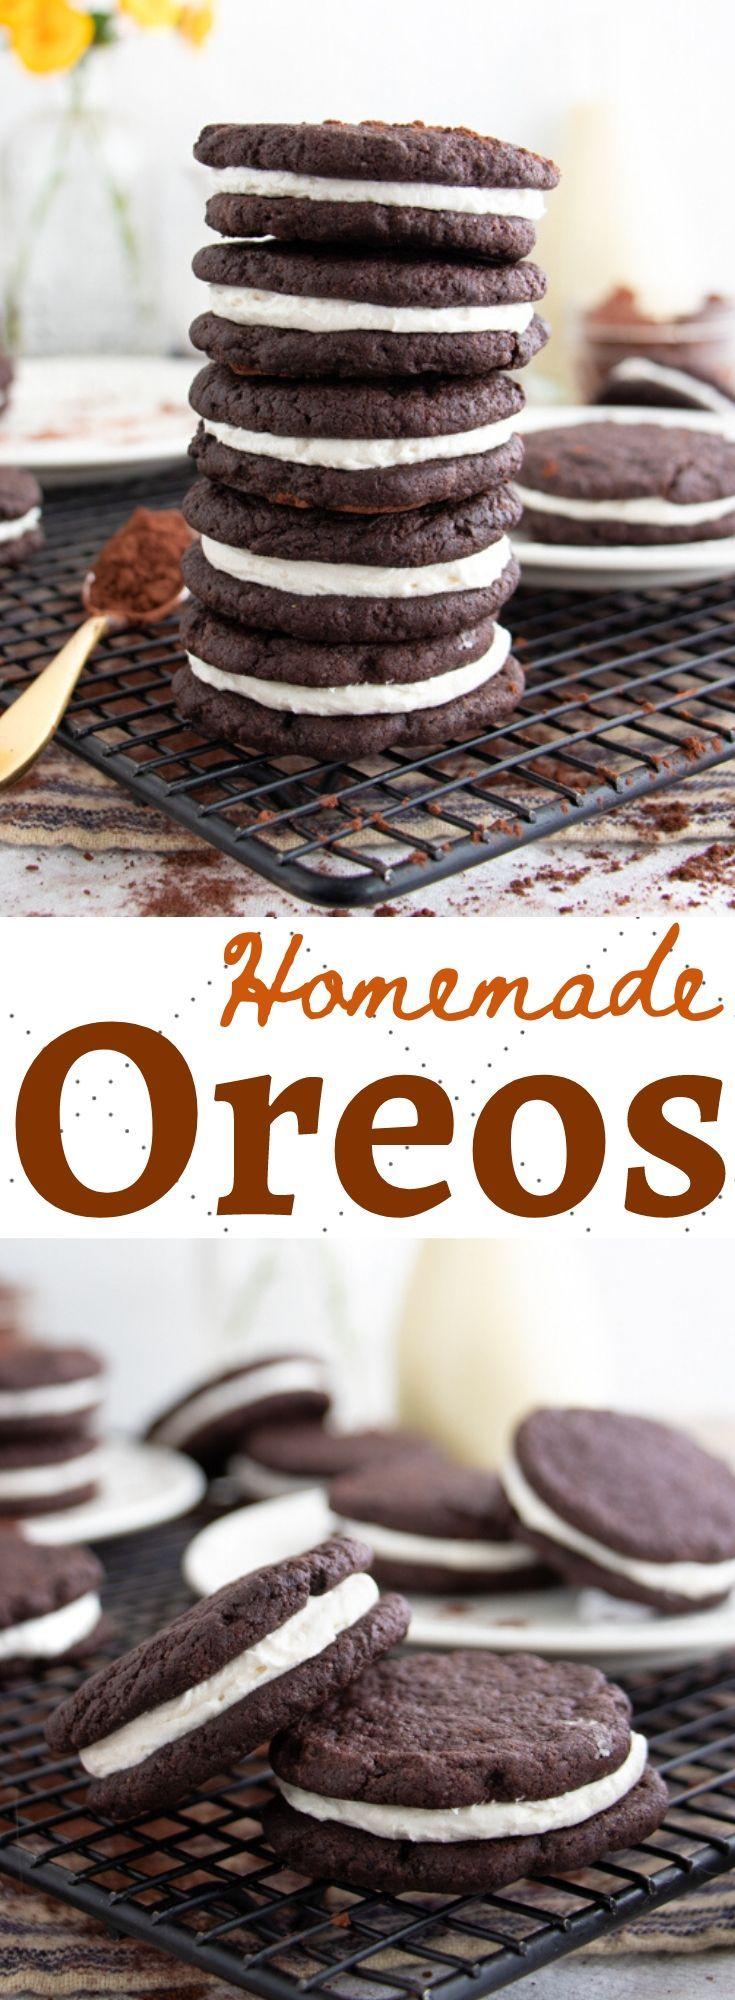 Homemade Oreo Recipe Plant Well Recipe In 2020 Vegan Cookies Recipes Oreo Recipes Healthy Vegan Desserts